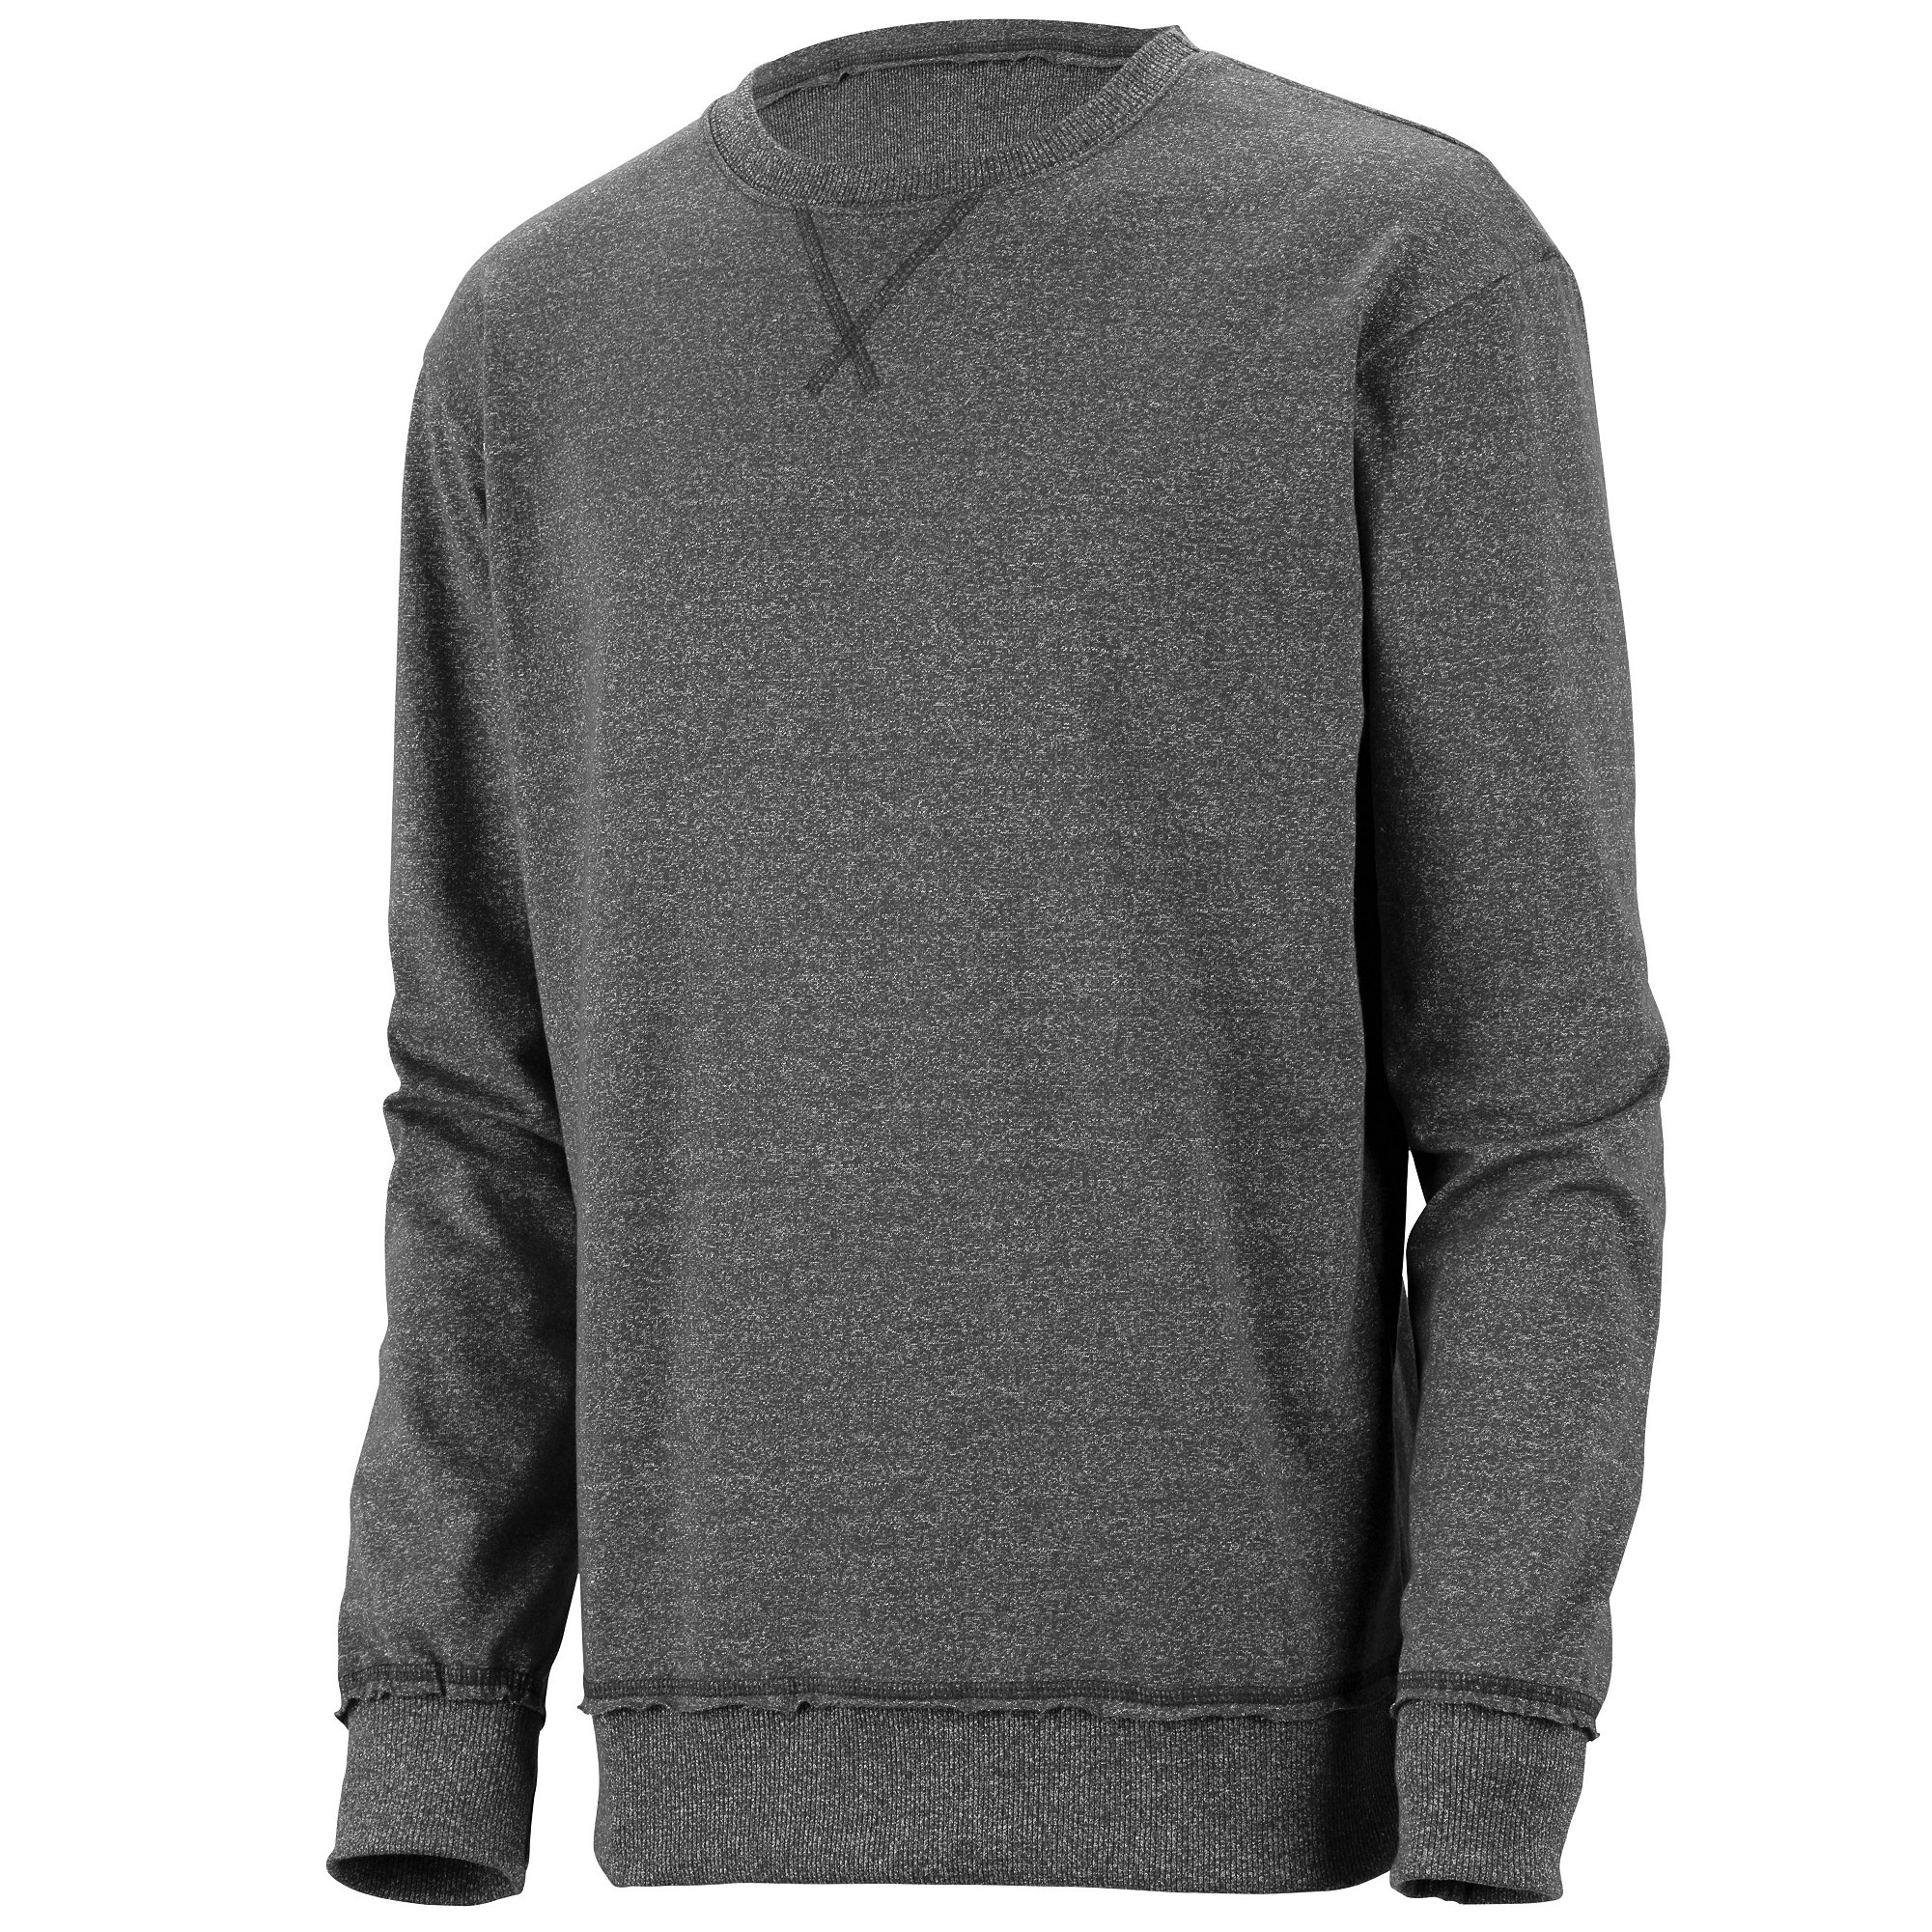 851ee65f6126 Mens Sweatshirt